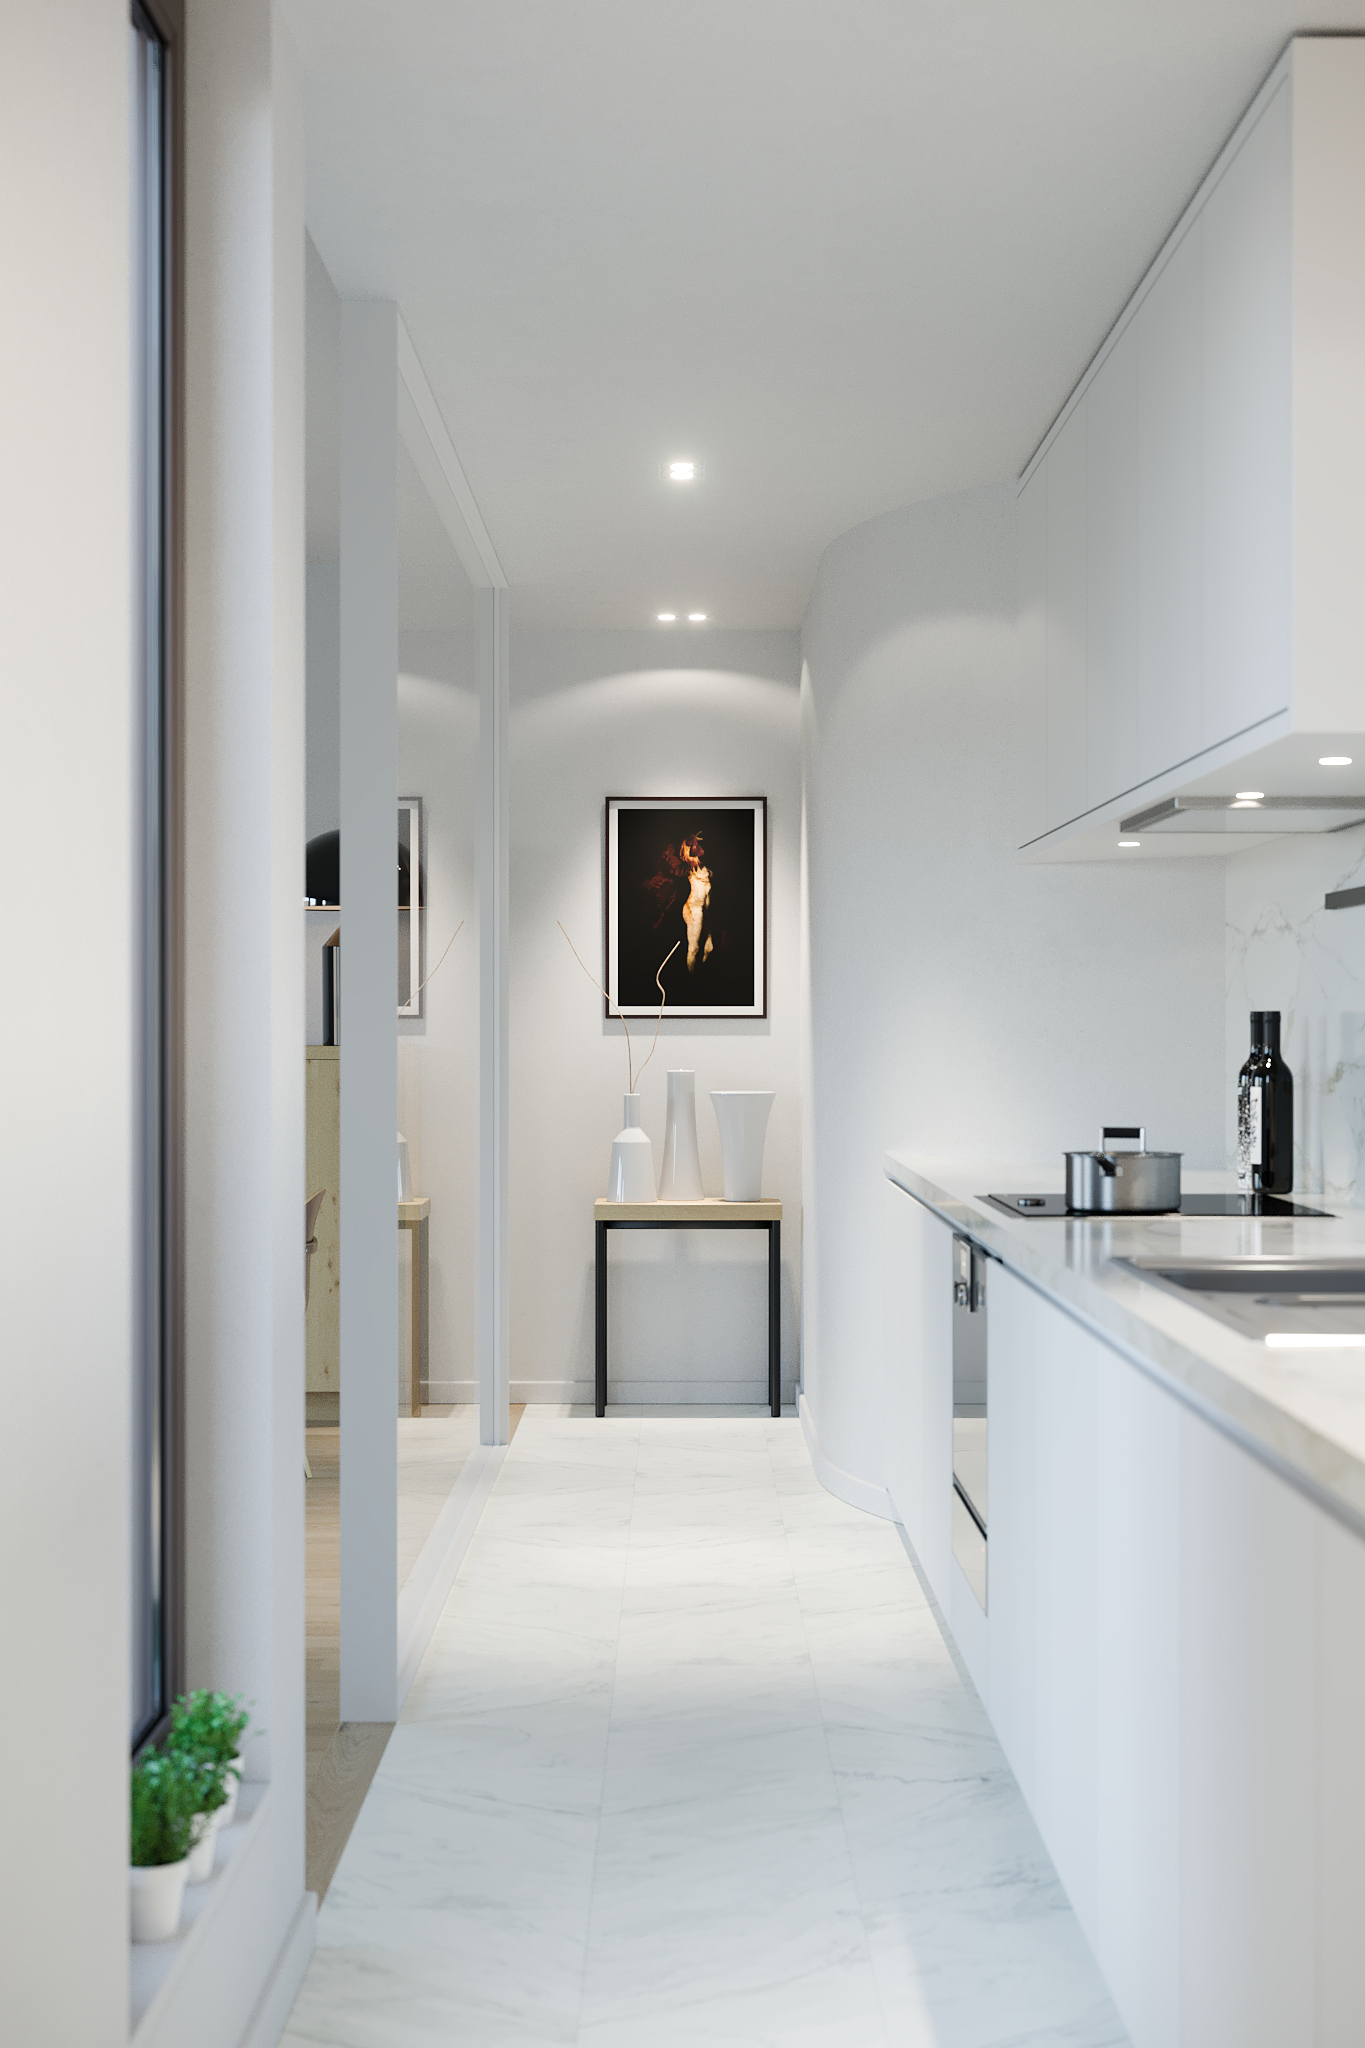 Carmine-Crimson Architectural Visualization Studio, atelier de visualisation architecturale.